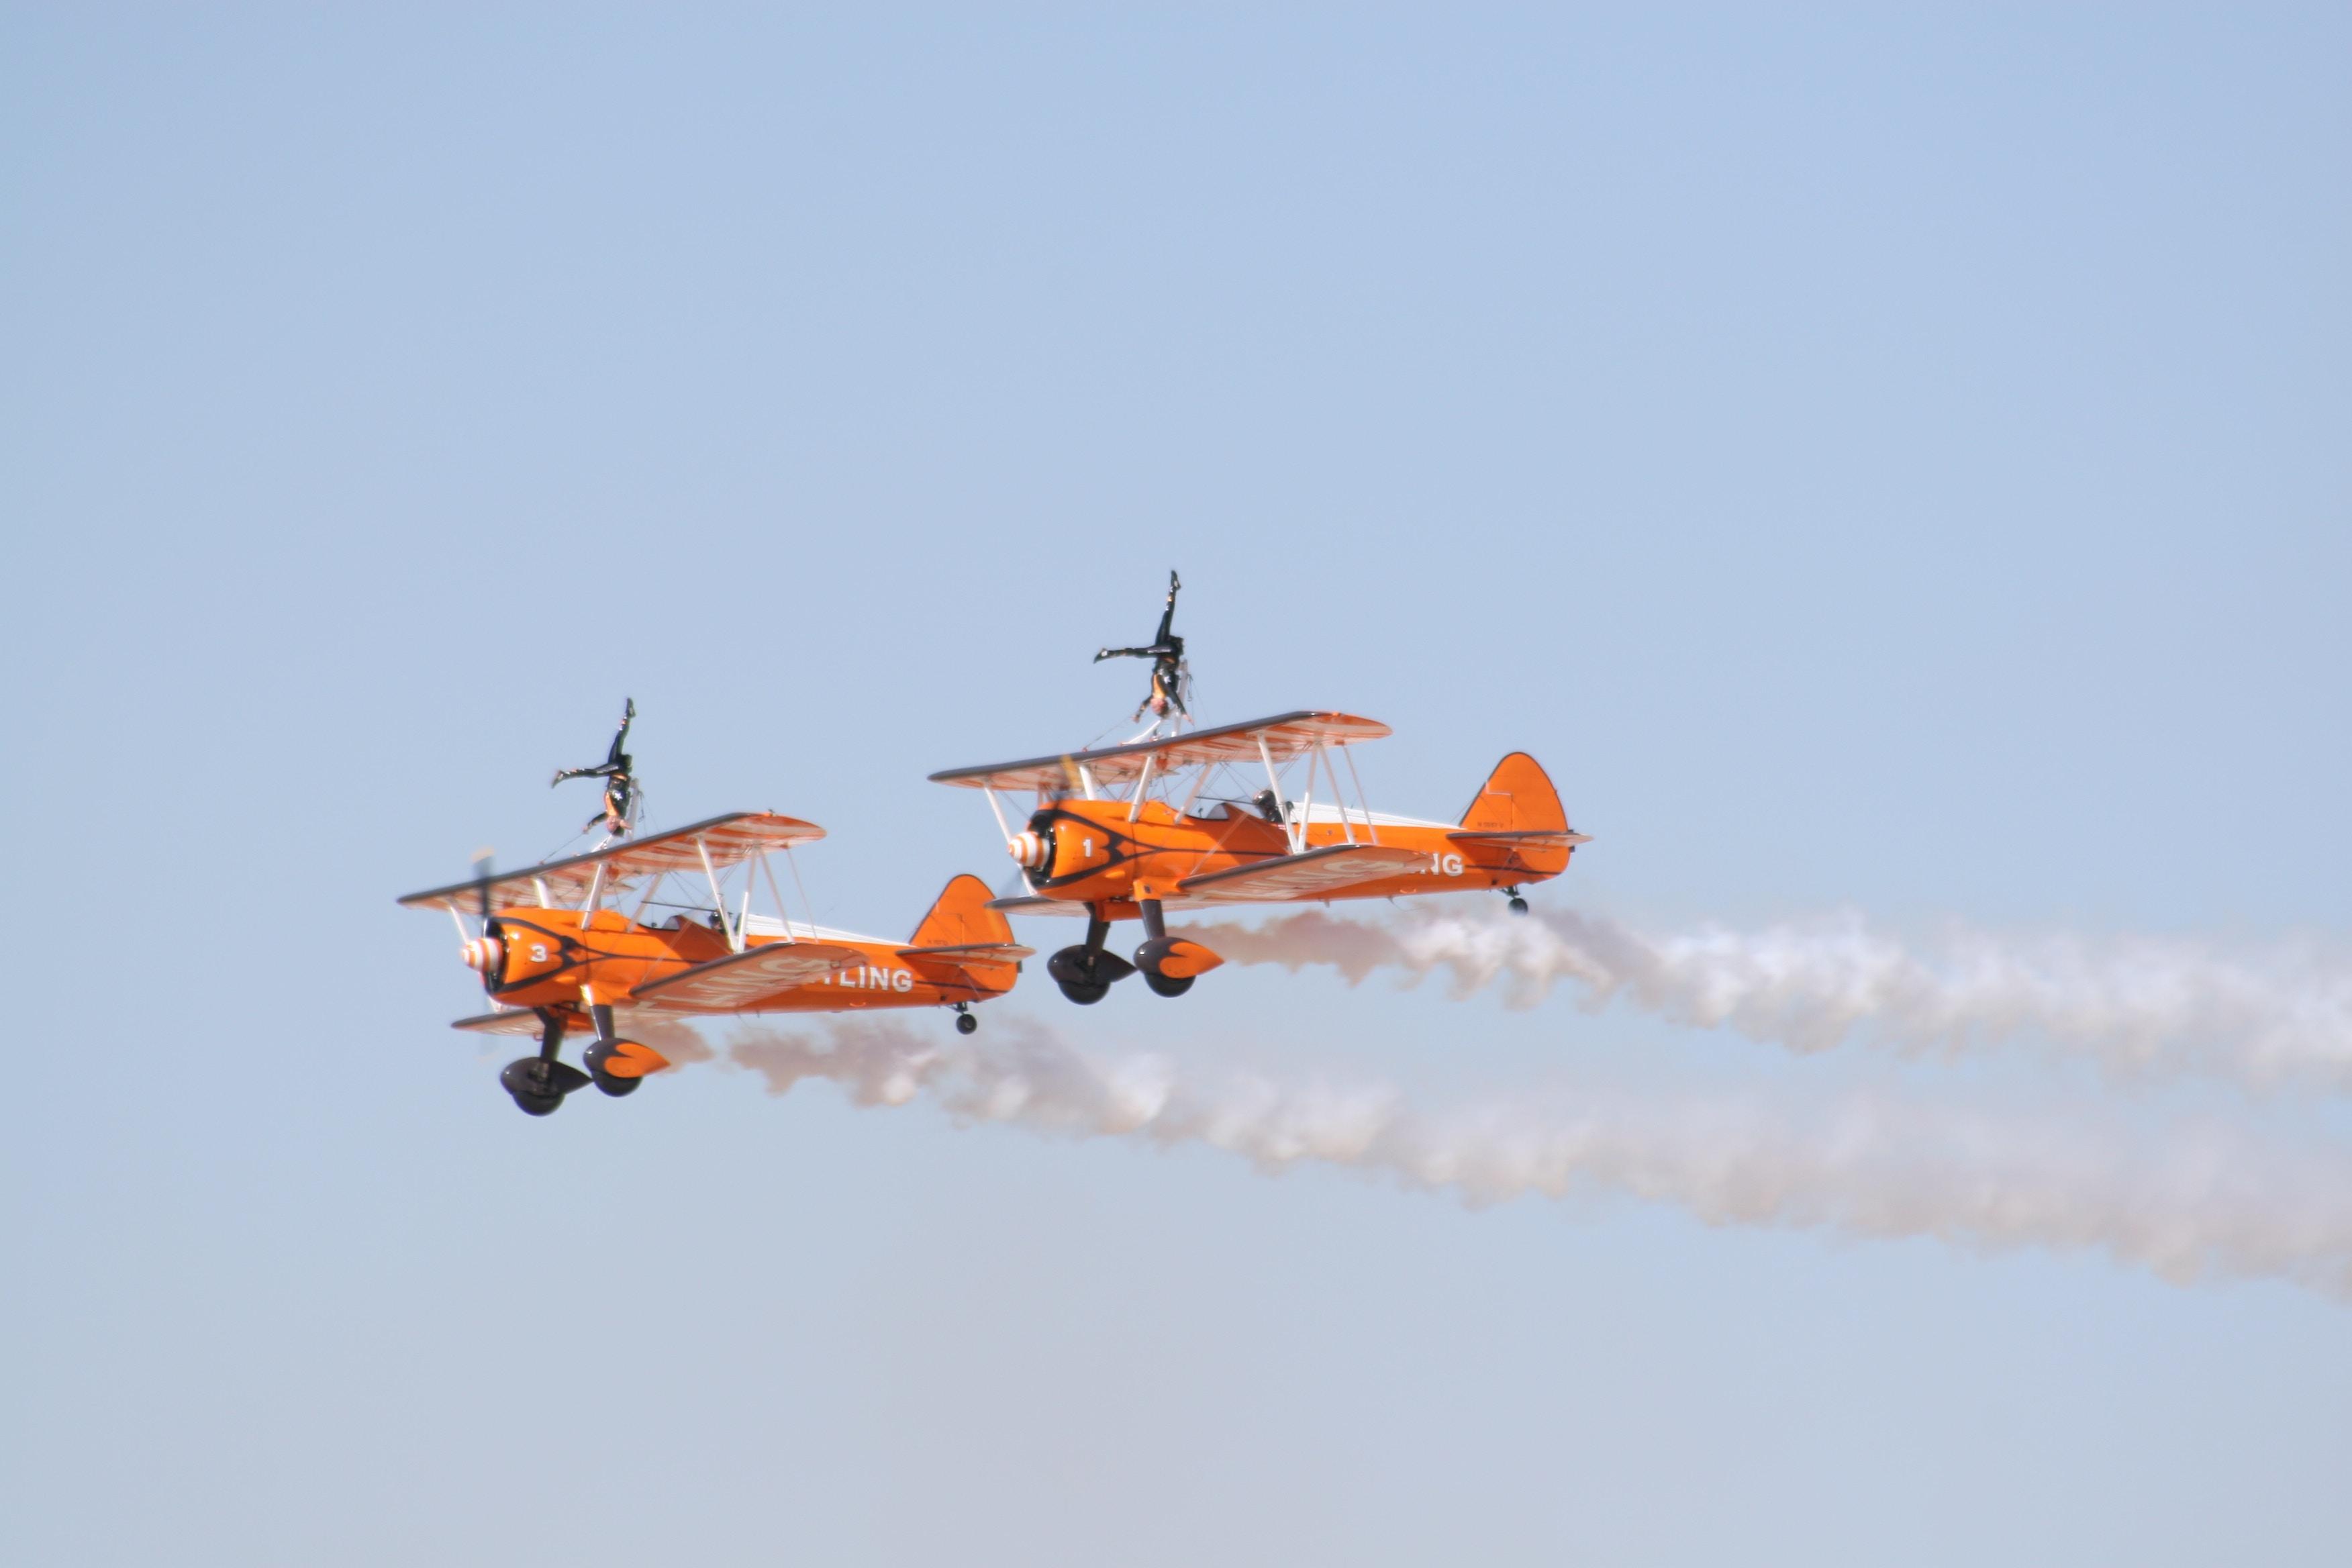 alaska air cargo, alaska photographer - alaskafoto